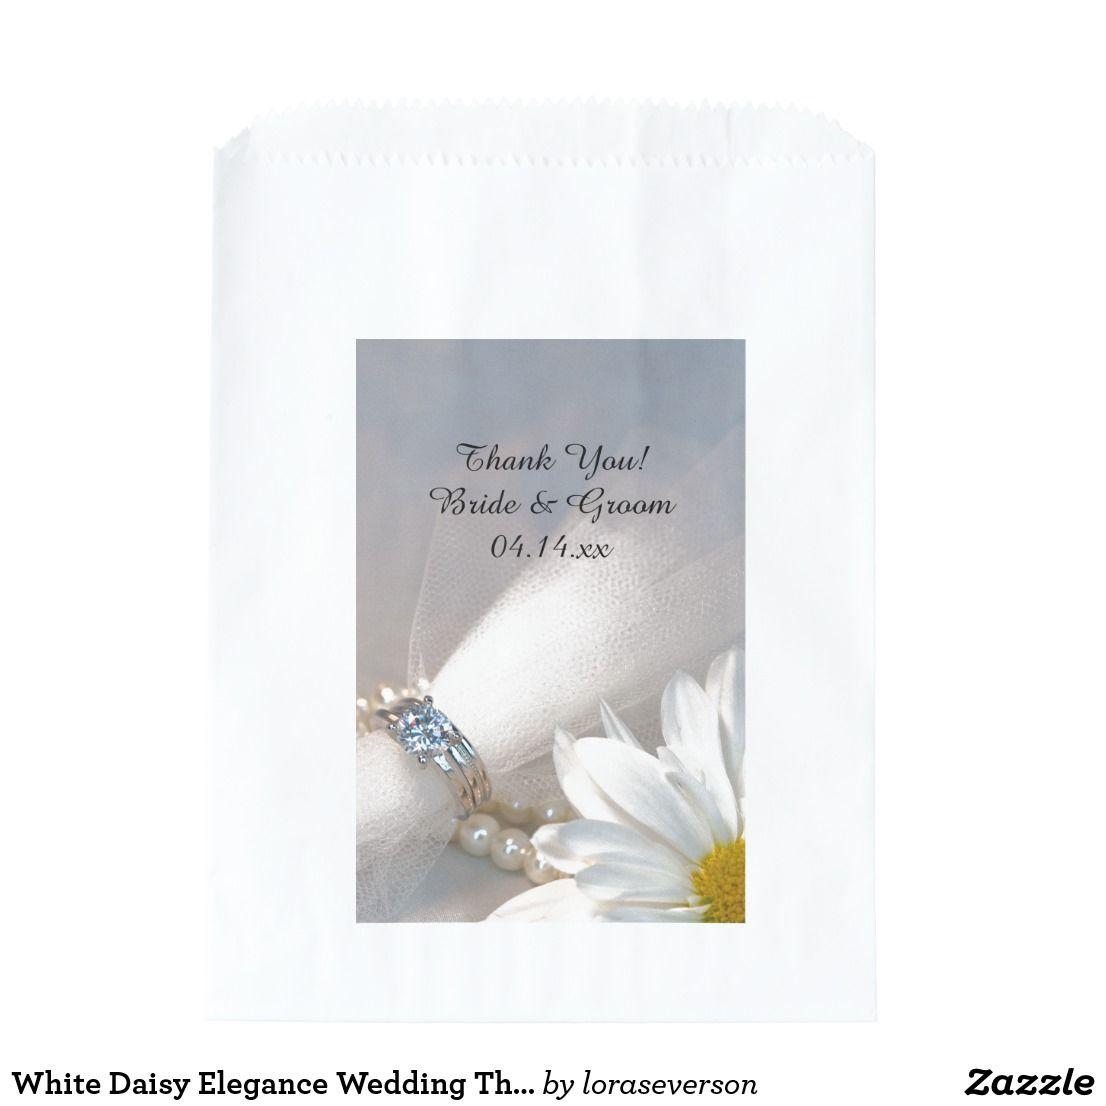 White Daisy Elegance Wedding Thank You Favor Bag   Favor bags ...